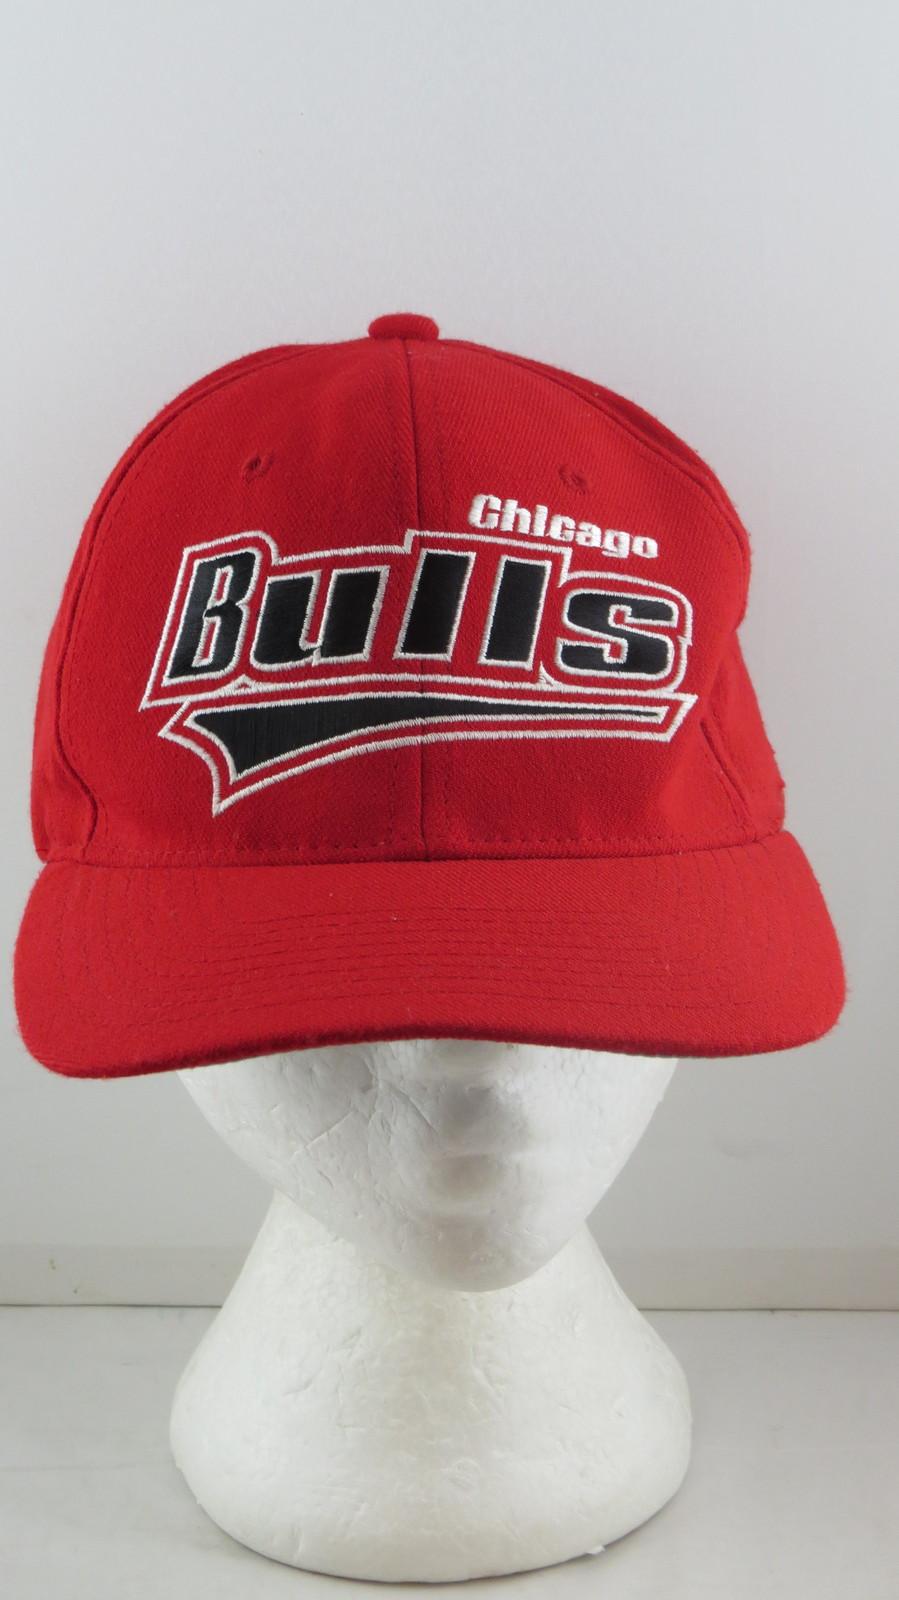 Chicago Bulls Hat (VTG) - Zoom Script by Starter - Adult One Size Star Fit